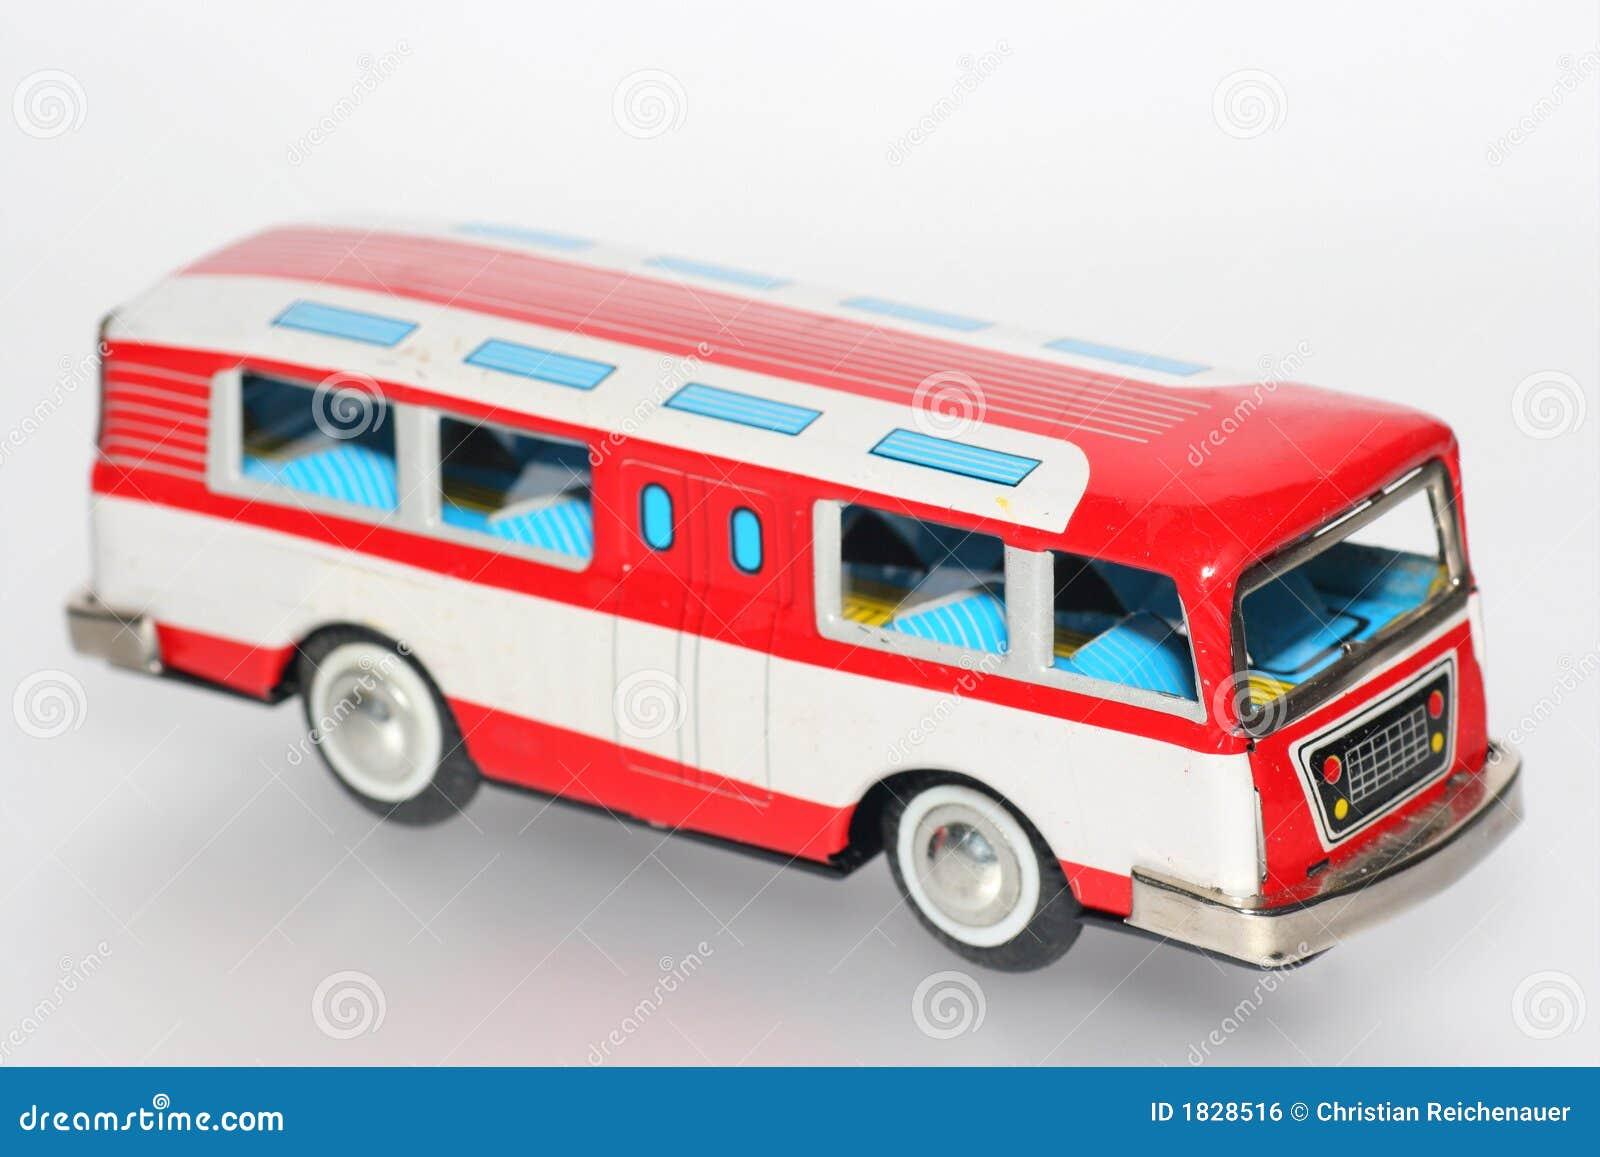 tin toy bus royalty free stock image image 1828516 christian christmas clipart free printable christian christmas clip art borders